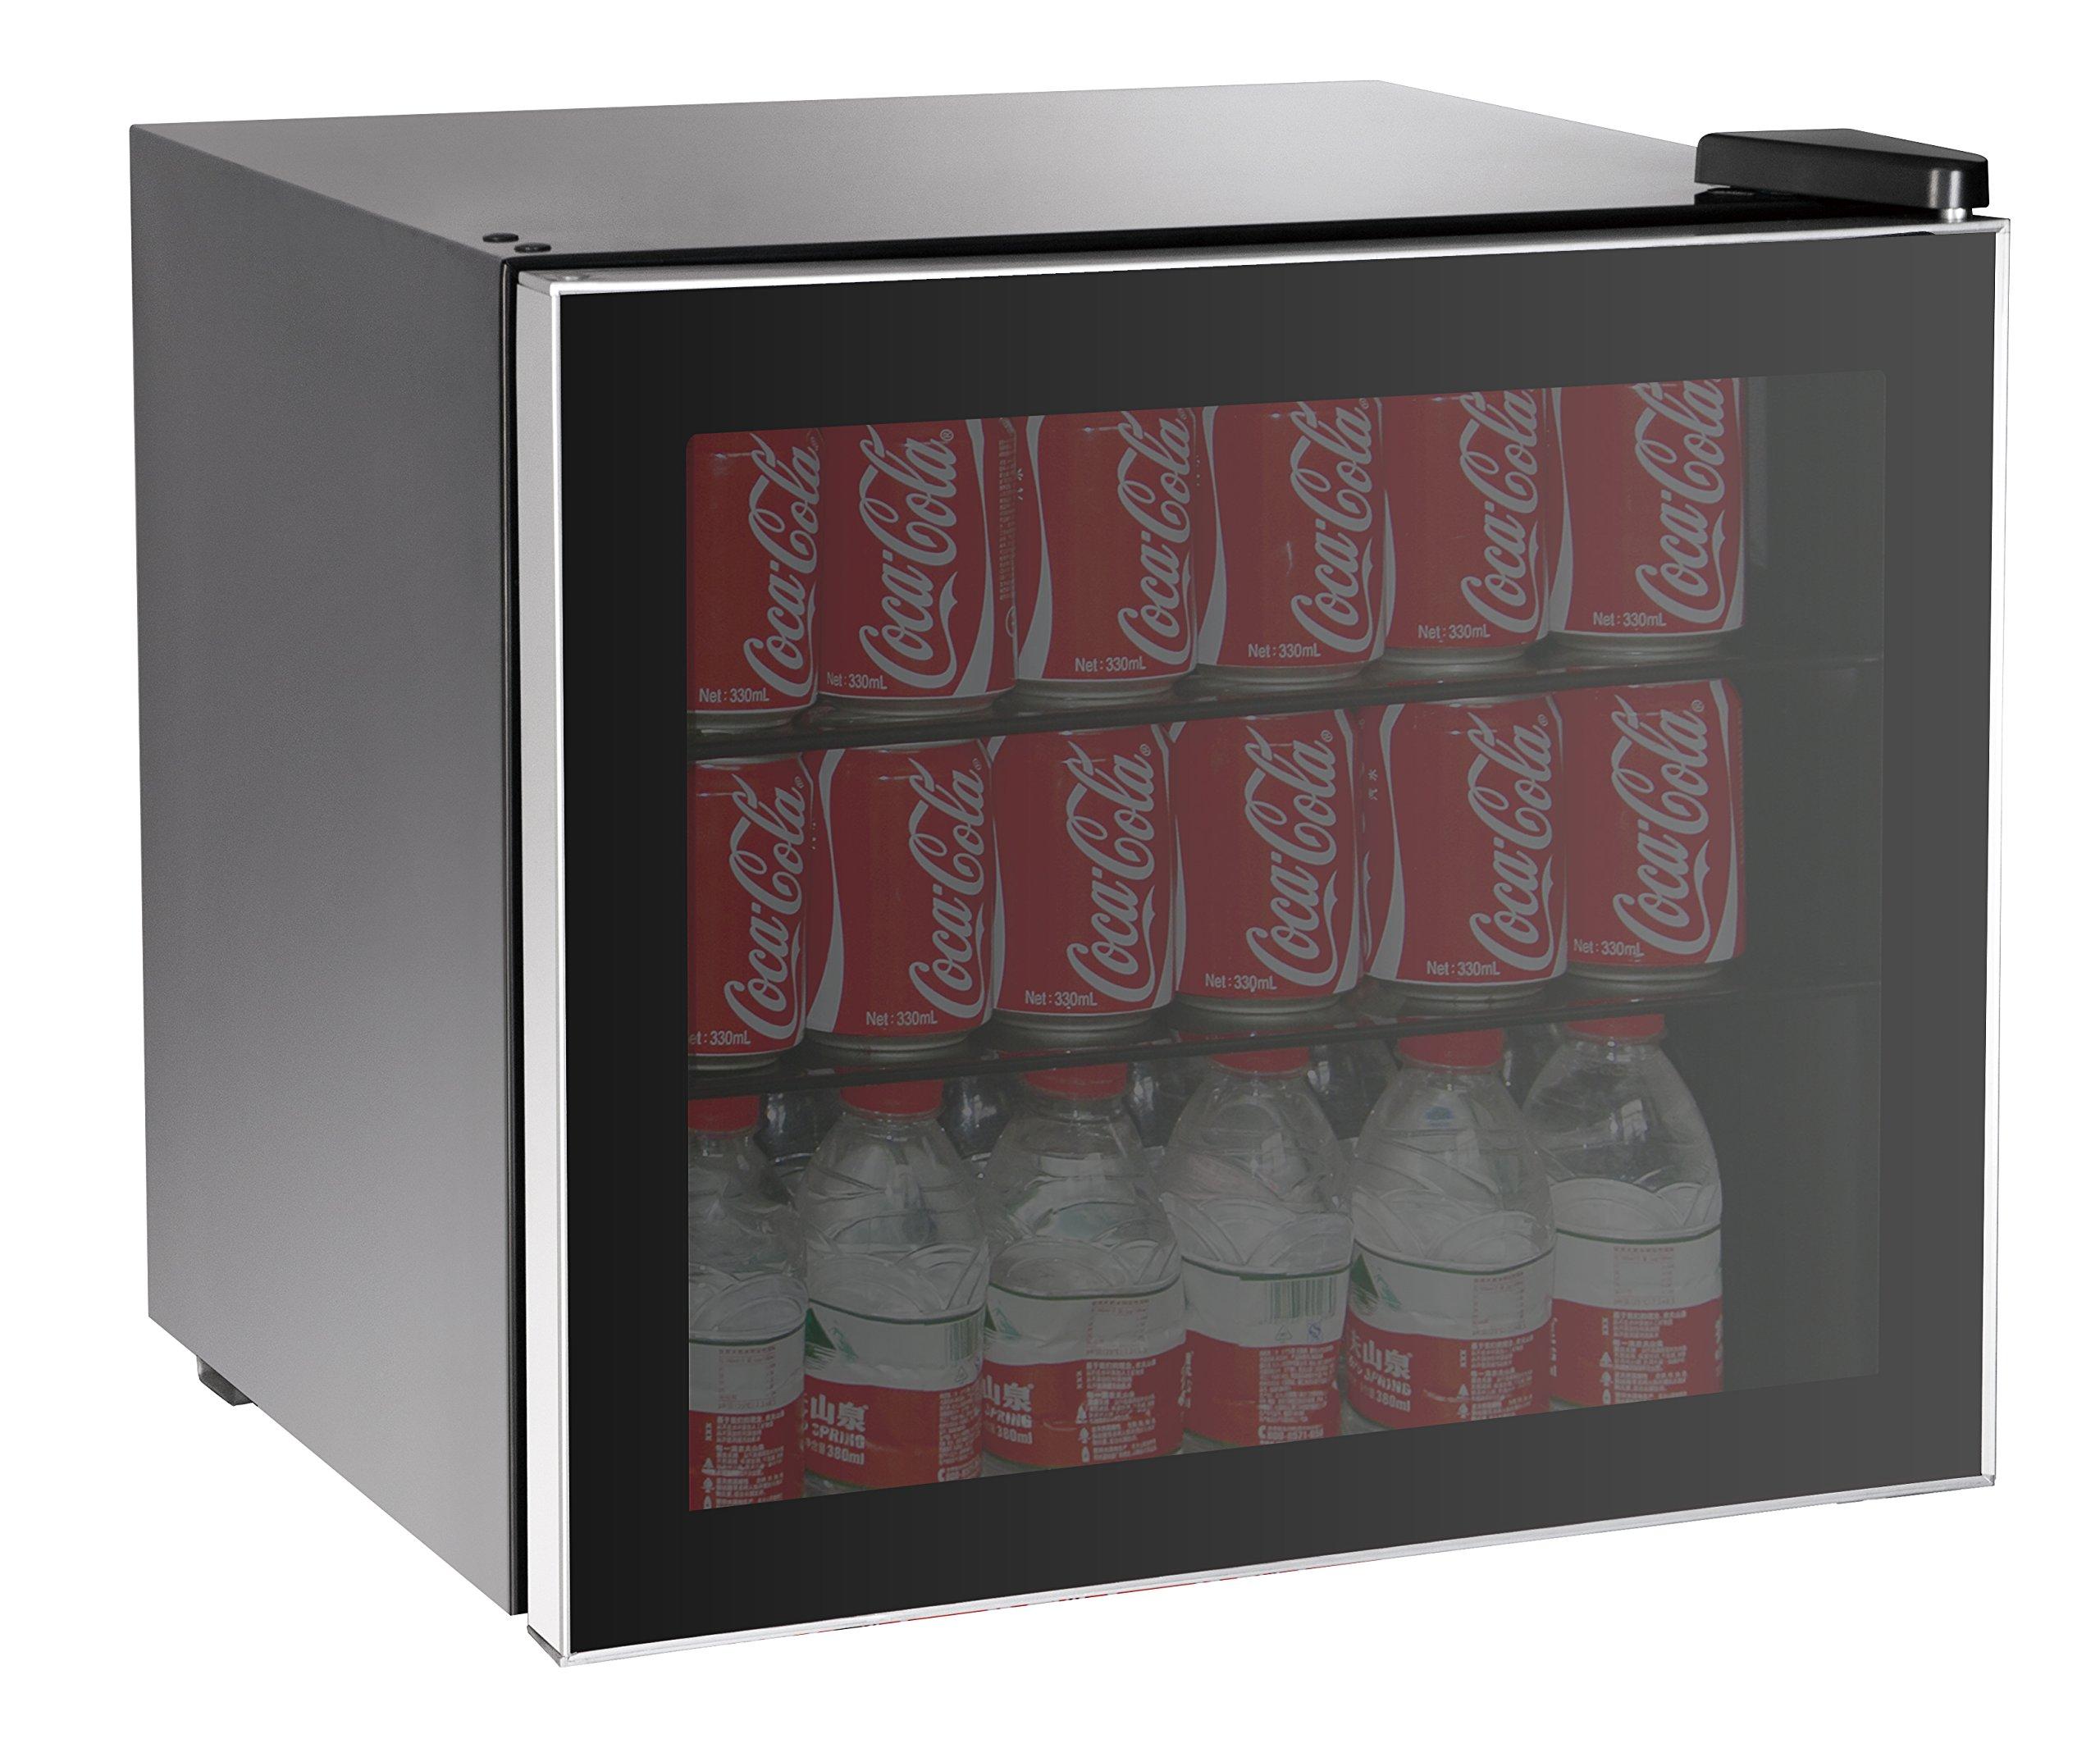 Igloo MIS104 70 Can Beverage Cooler, Black